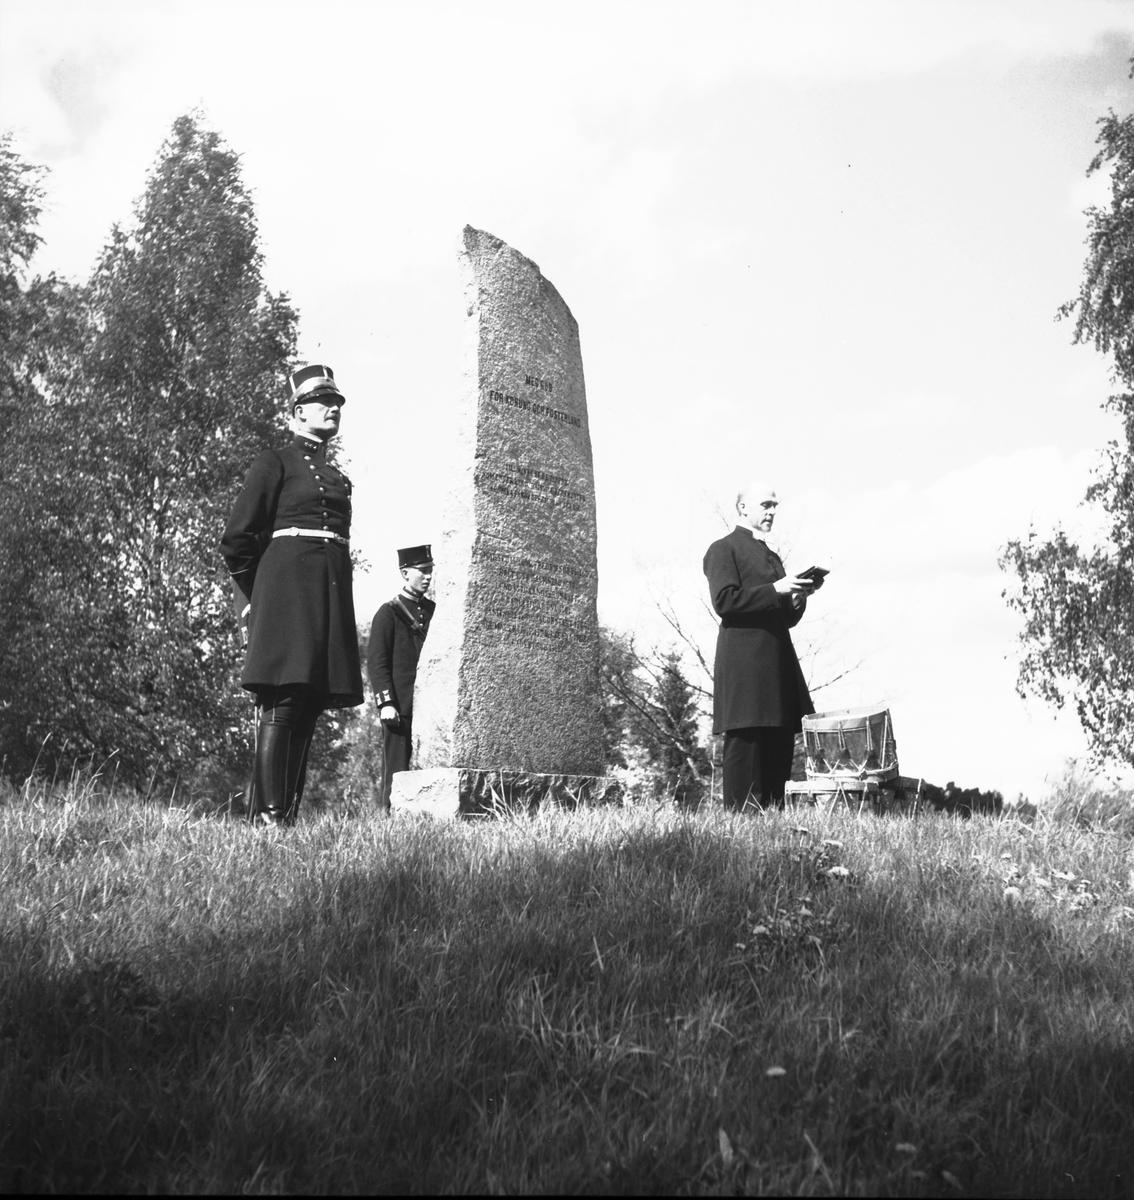 Landstormen. Kyrkoherde Jonzon håller bön. Den 1 juni 1936